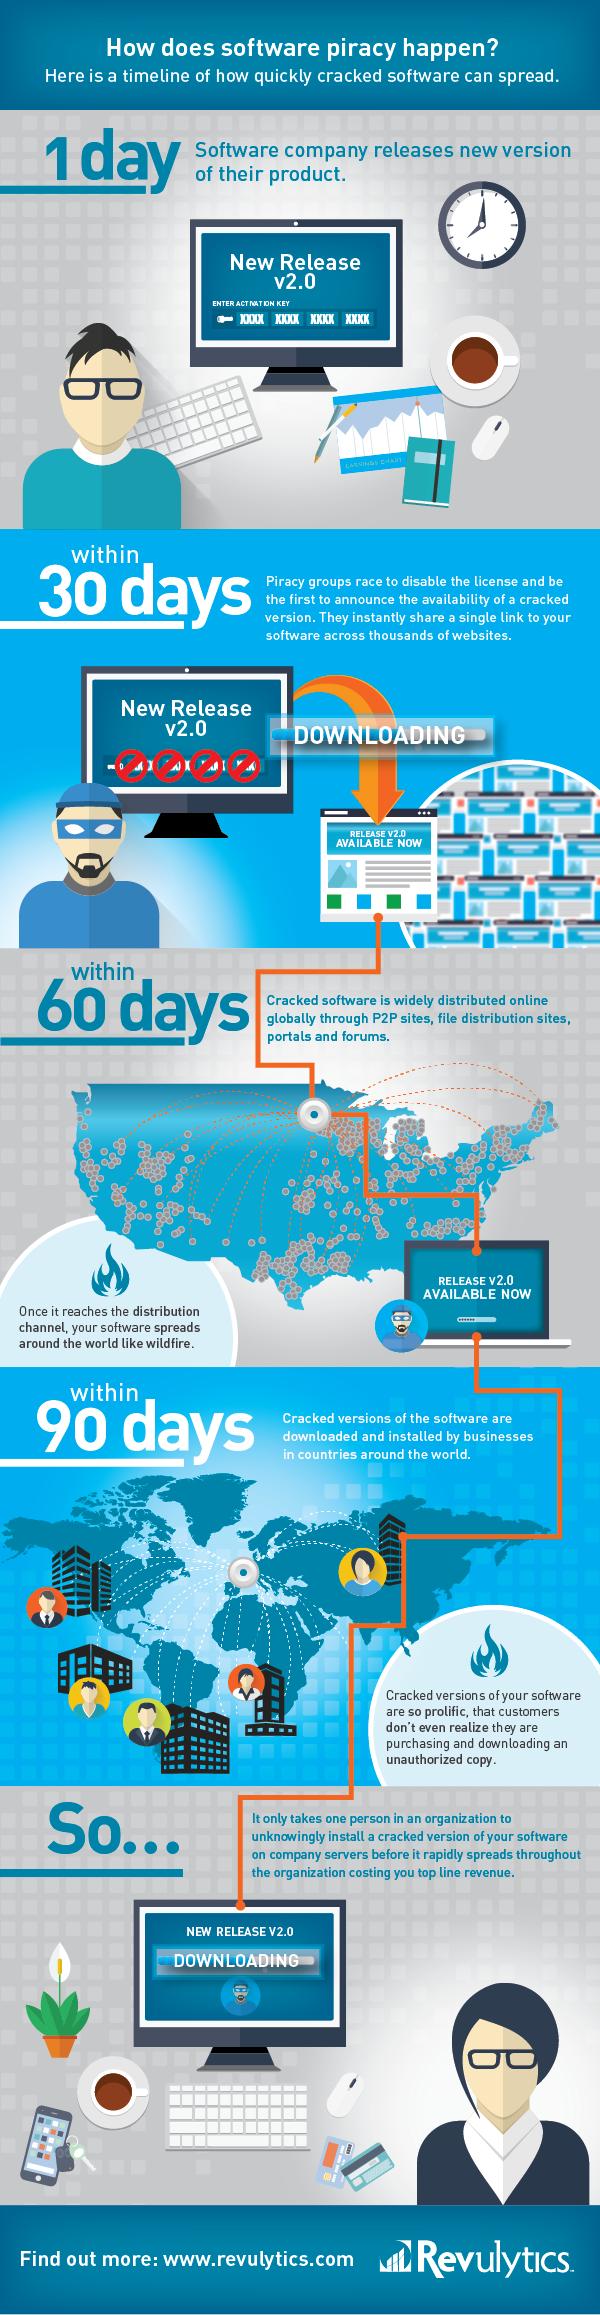 Infographic_HowDoesPiracyHappen.png